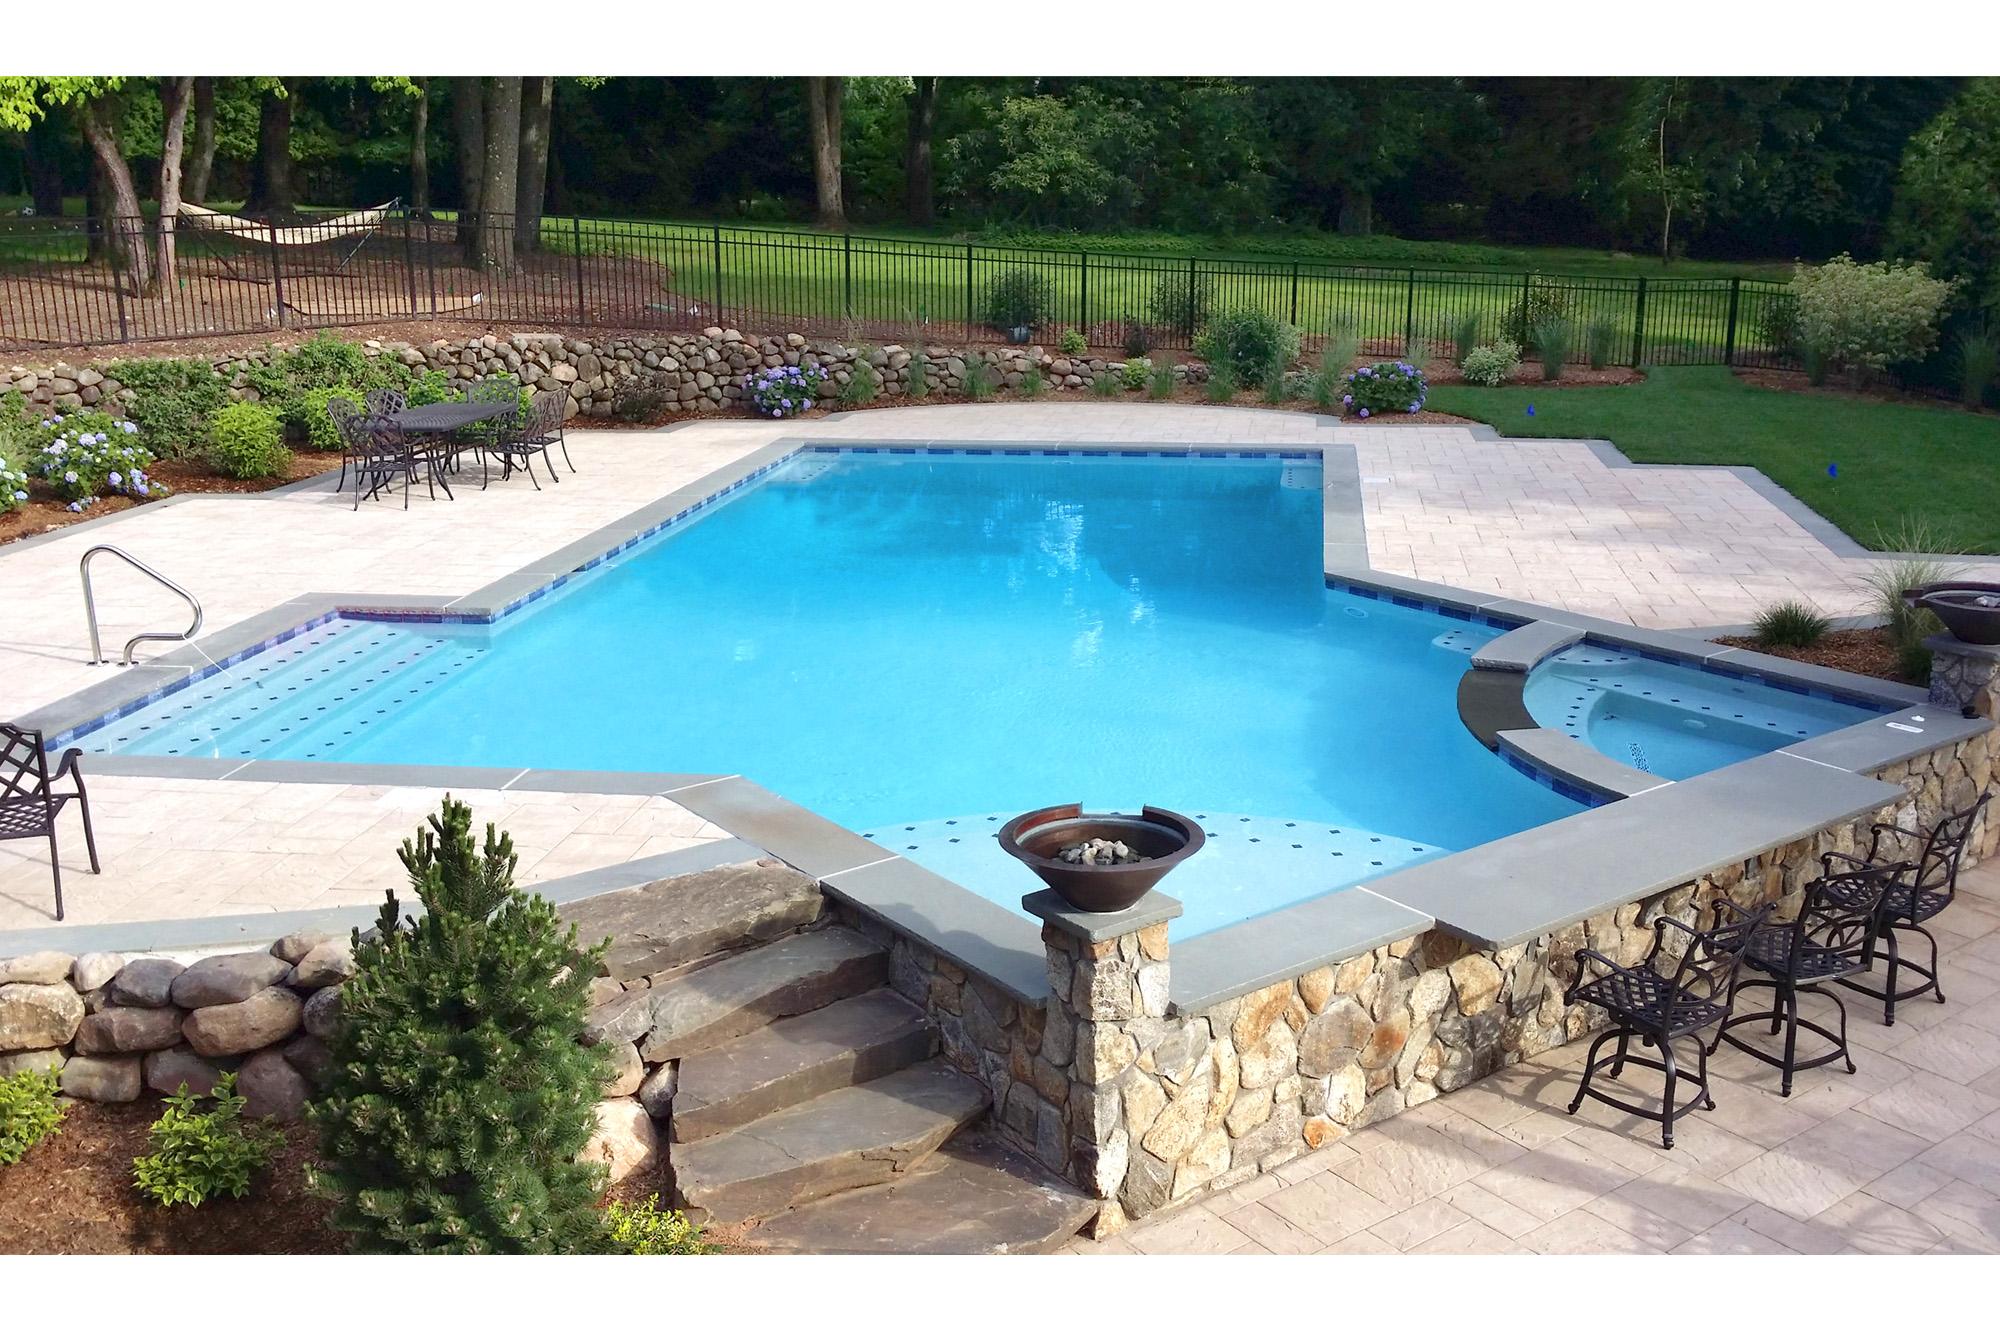 Masterson Pools | Saddle River Pool Builder